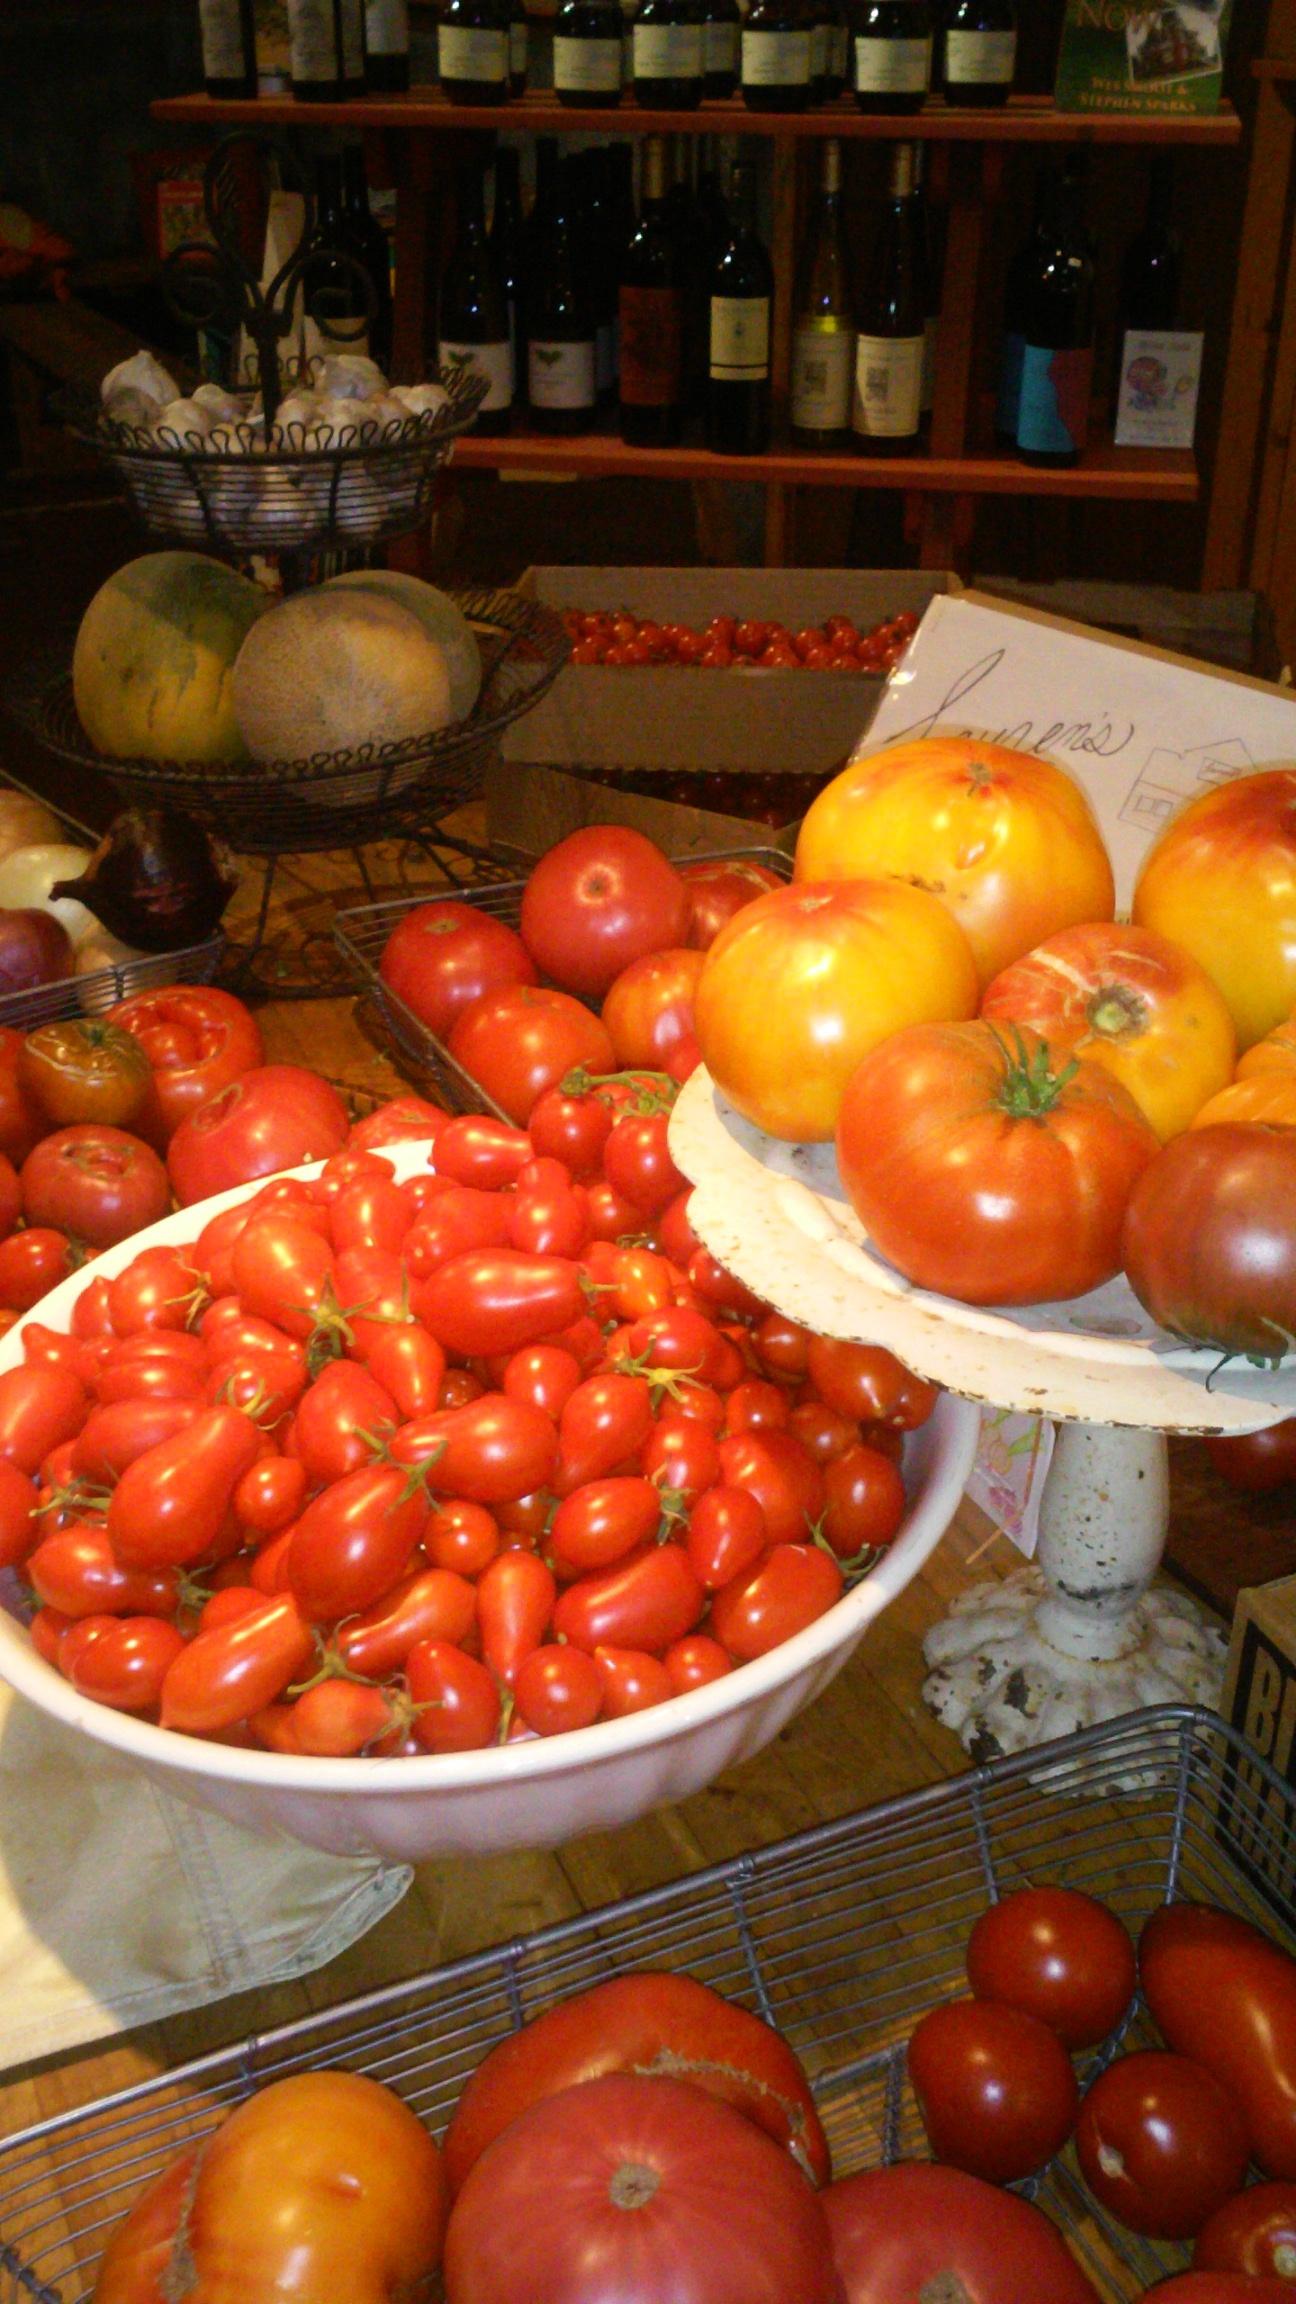 produce tomatoes wine background.jpg